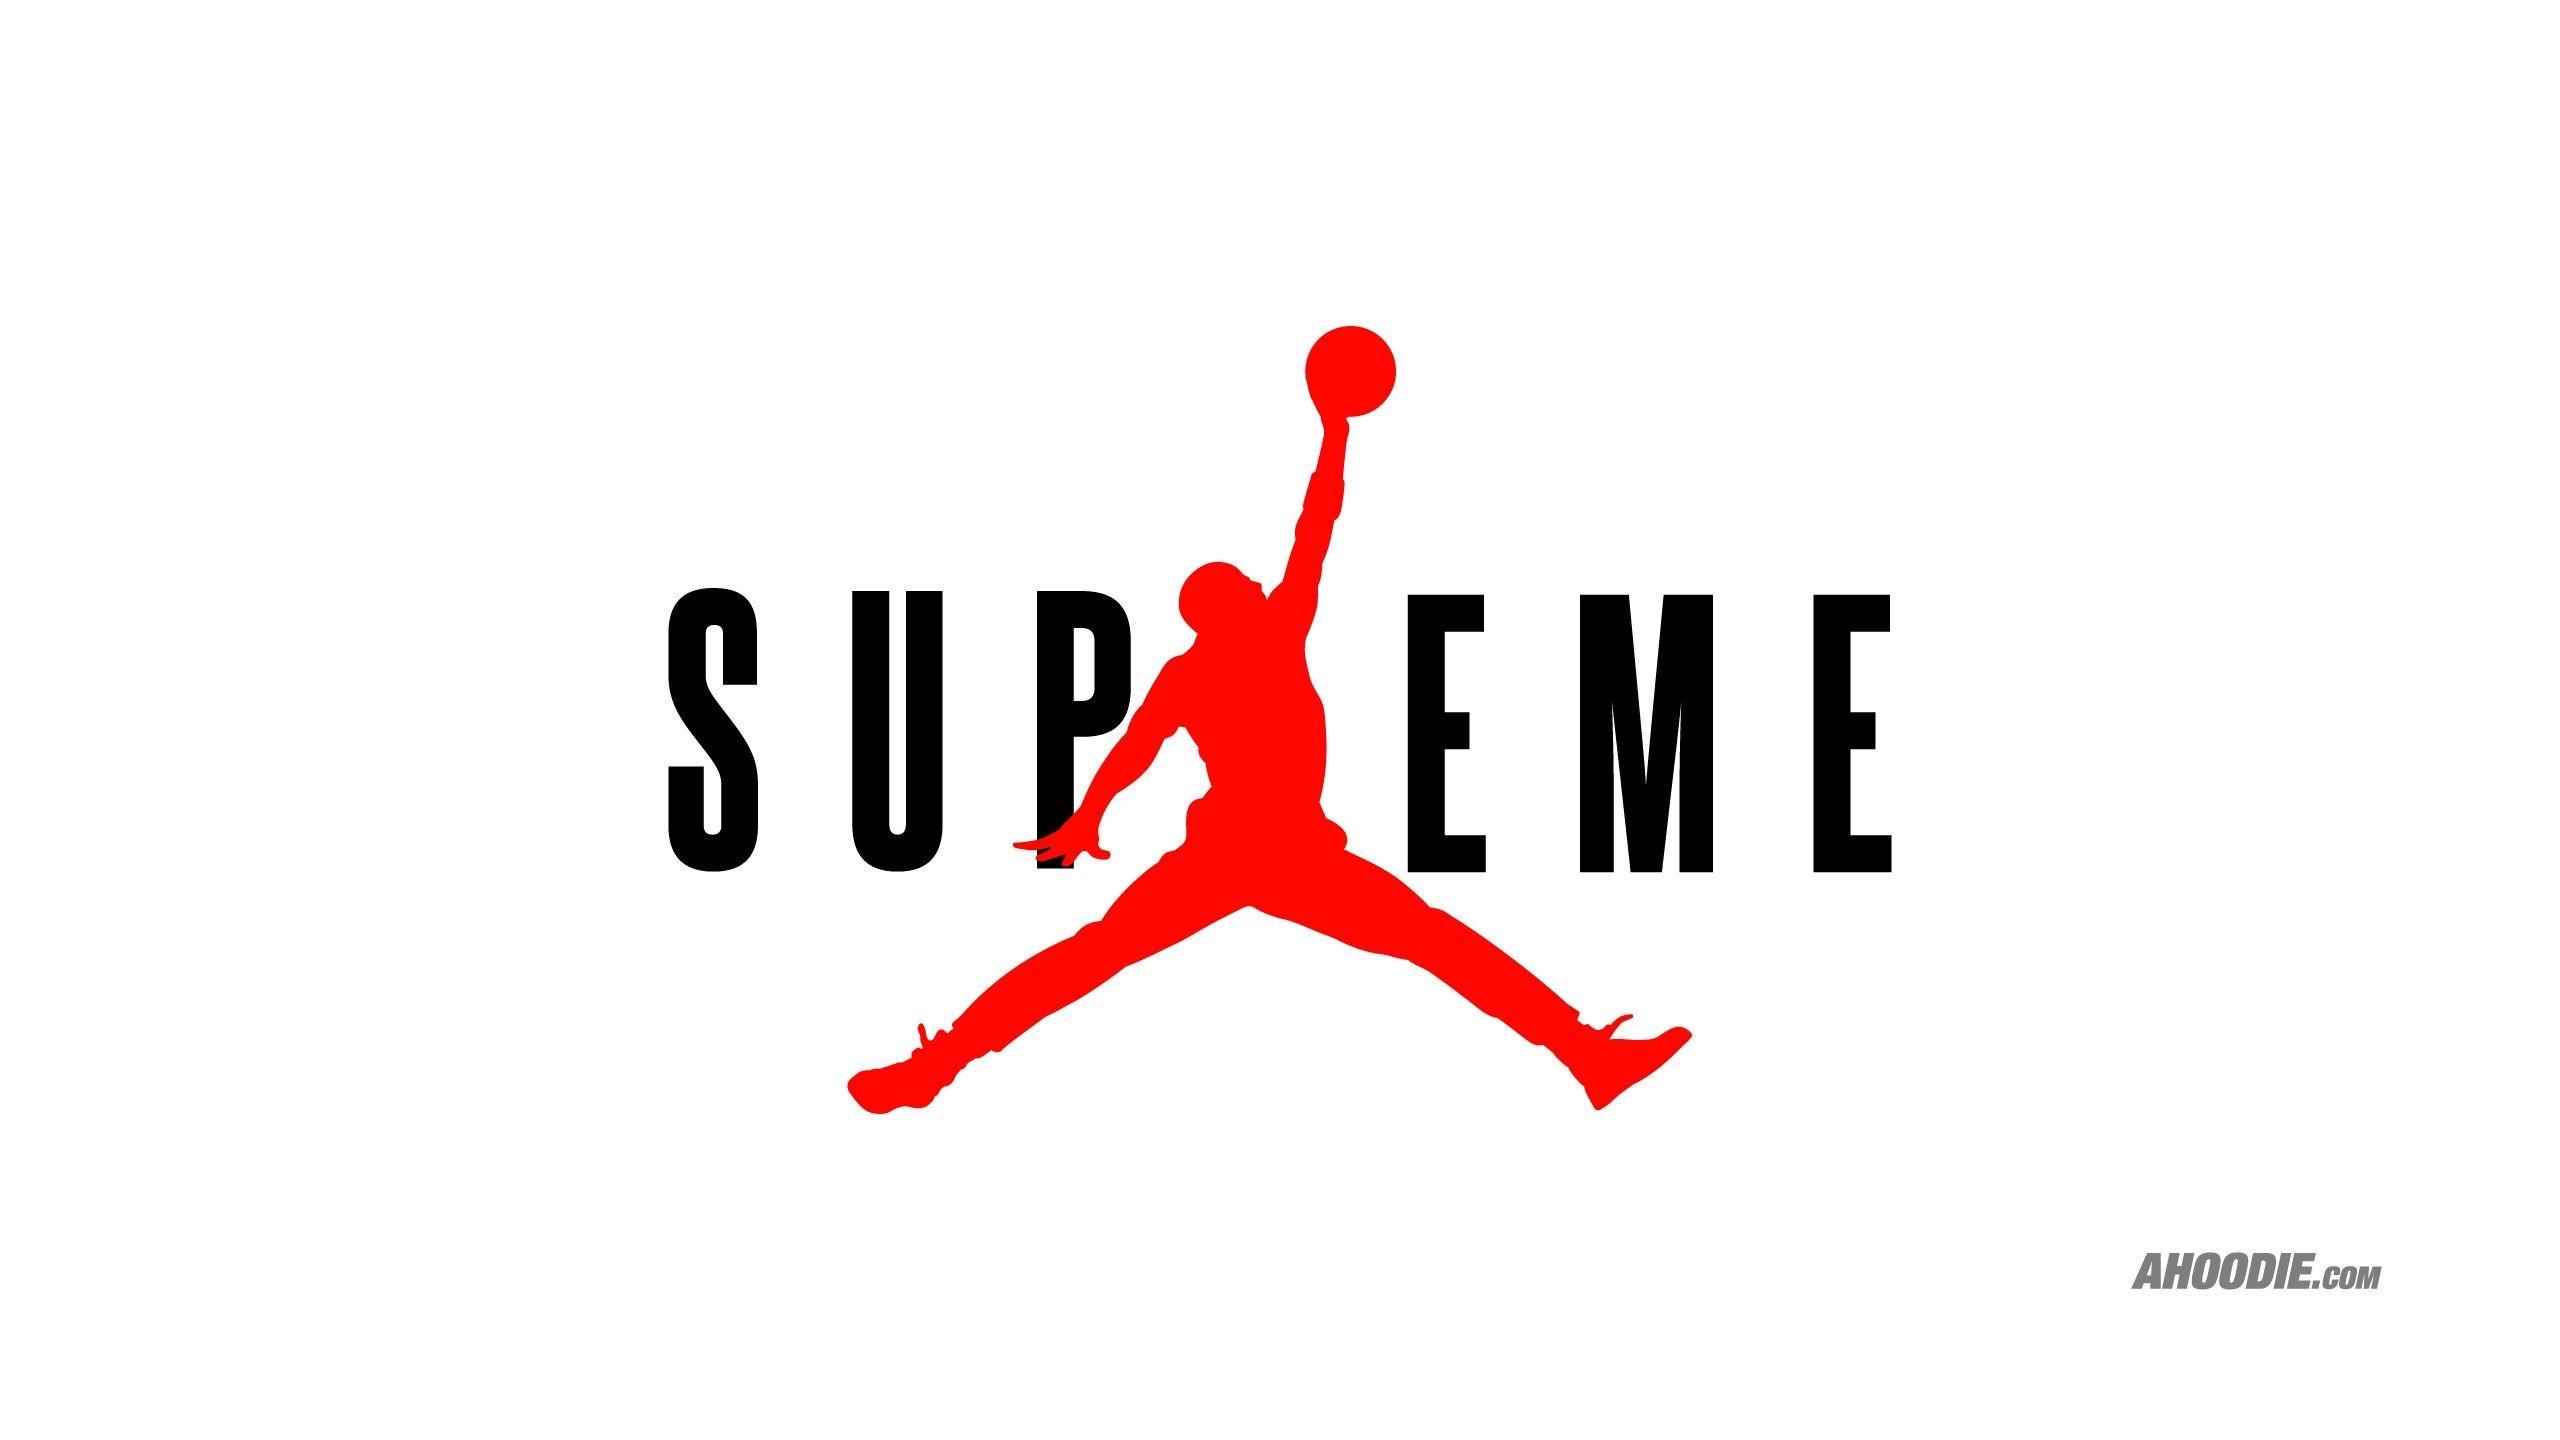 Res 2560x1440 Supreme X Jordan Supreme X Jordan Supreme X Jordan Supreme Wallpaper Supreme Wallpaper Hd Jordan Logo Wallpaper